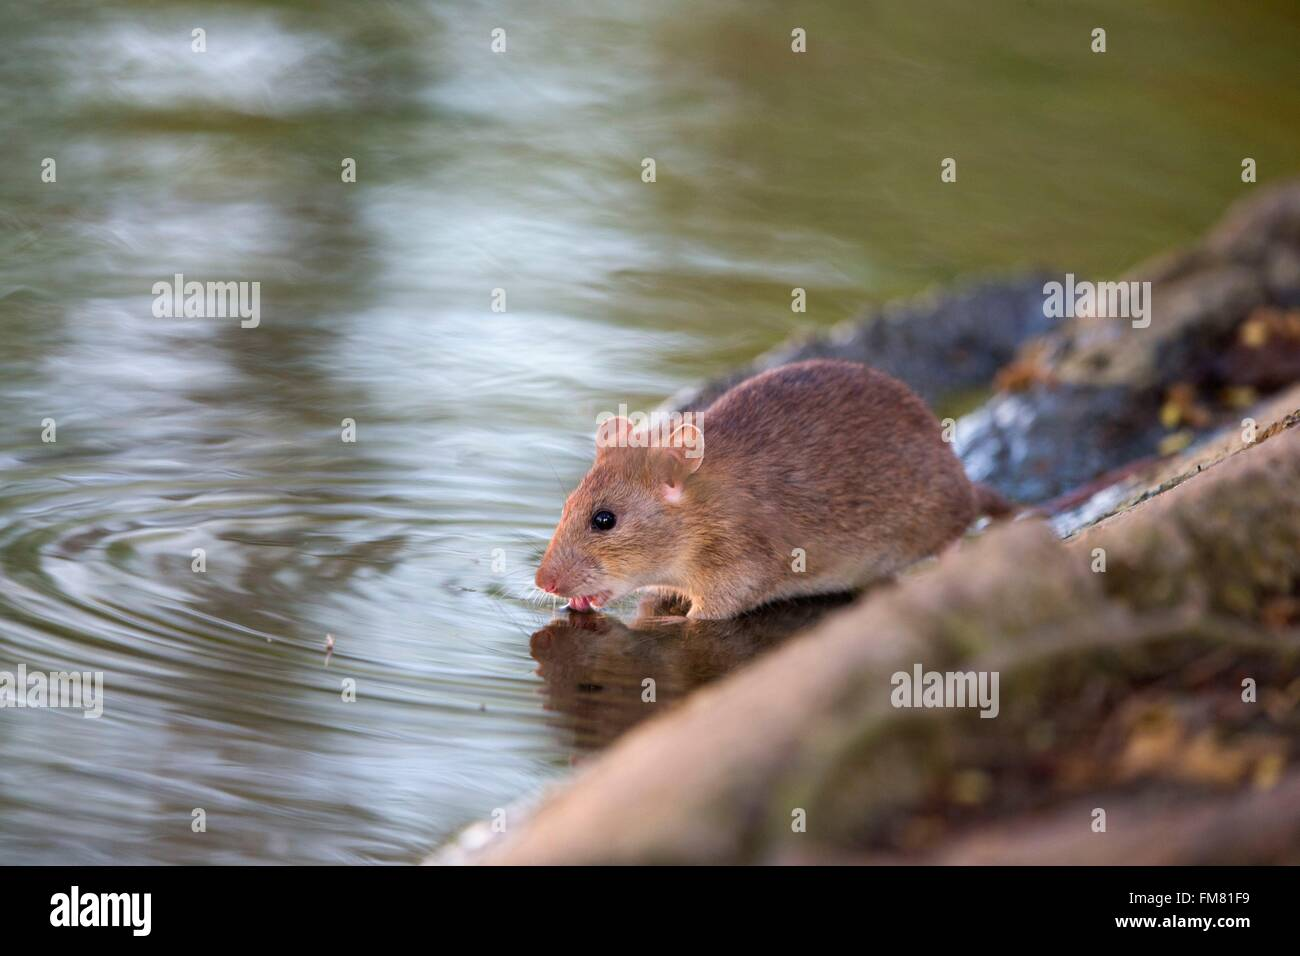 France, Bas Rhin, Selestat, Brown rat, also referred to as common rat, street rat, sewer rat, Hanover rat, Norway - Stock Image